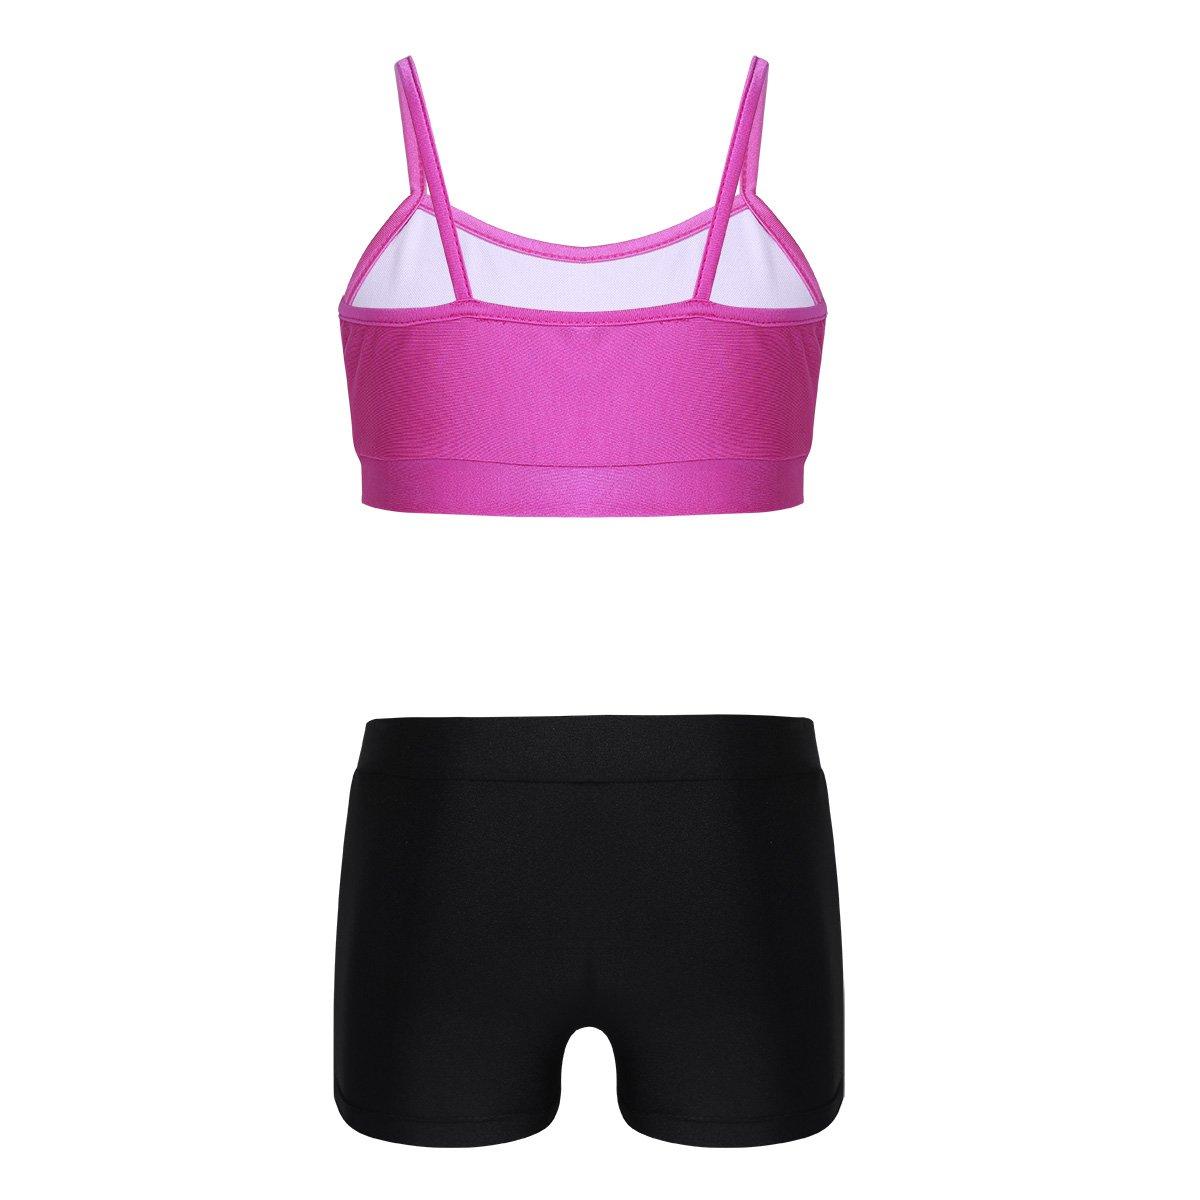 inlzdz Kids Girls Two Piece Tankini Ballet Dance Outfits Spaghetti Shoulder Straps Tops with Bottoms Set Dancewear